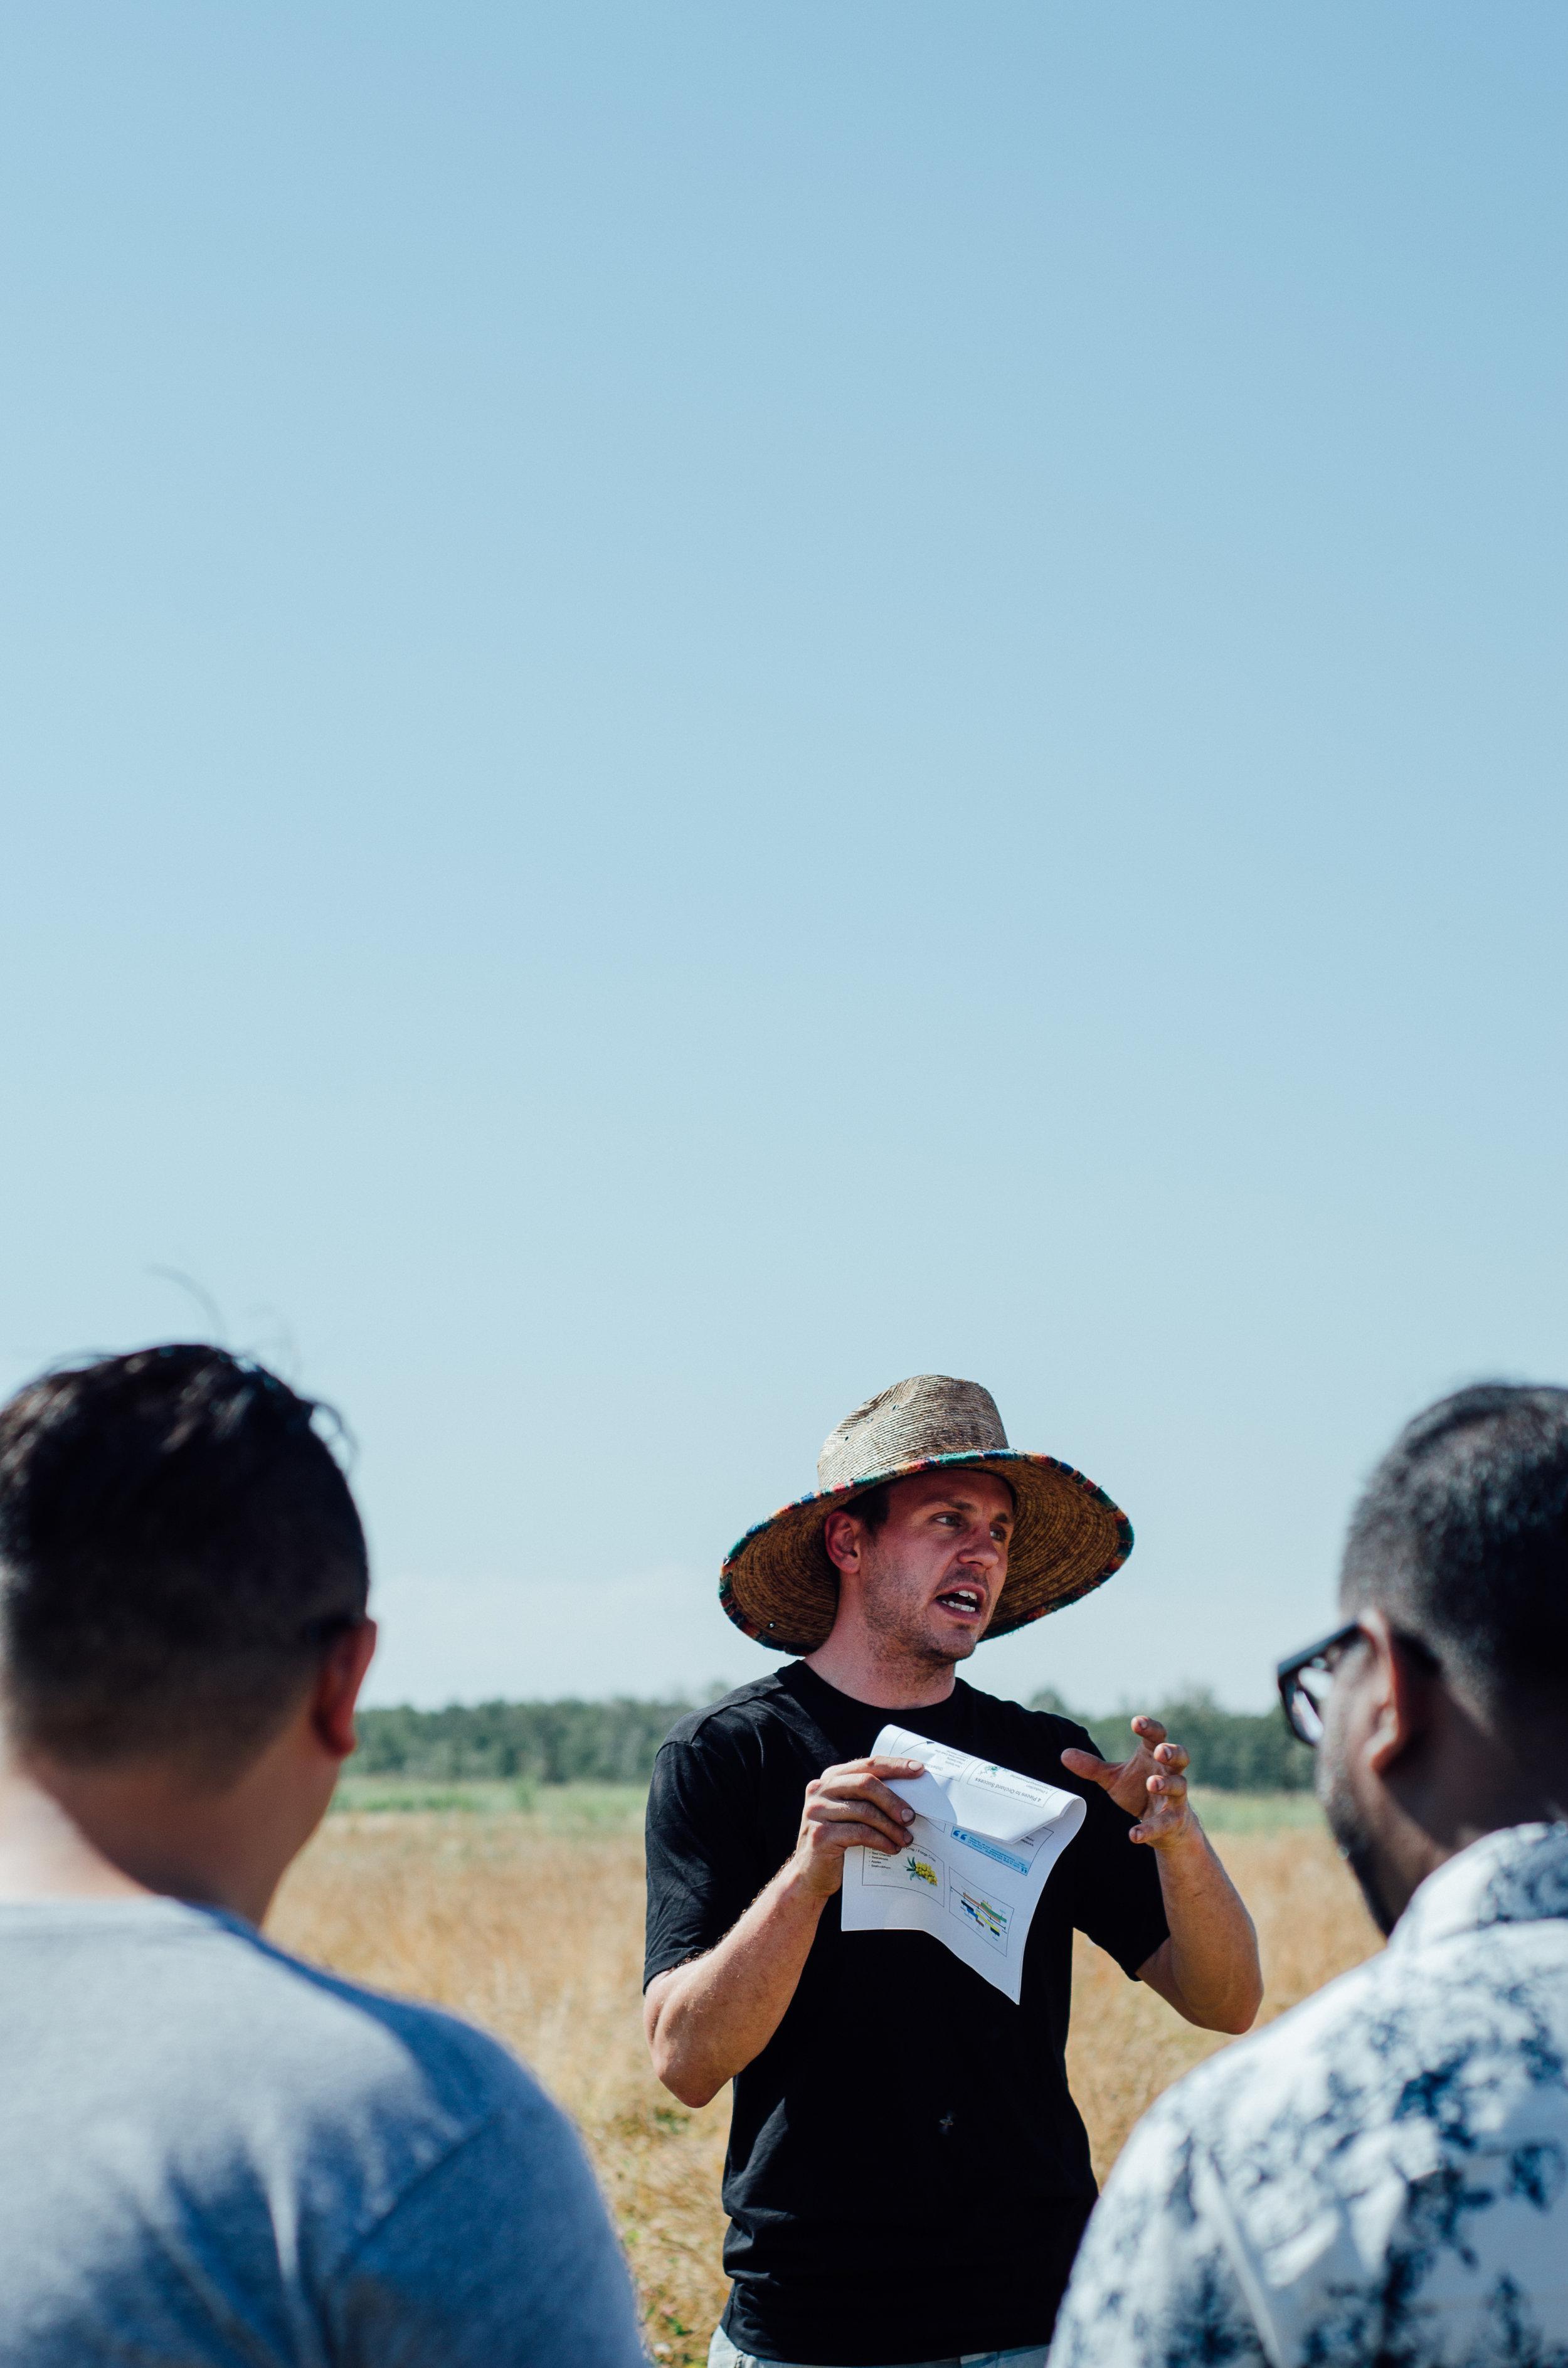 First Farm Tour - Alberta Haskap Farm - Rosy Farms